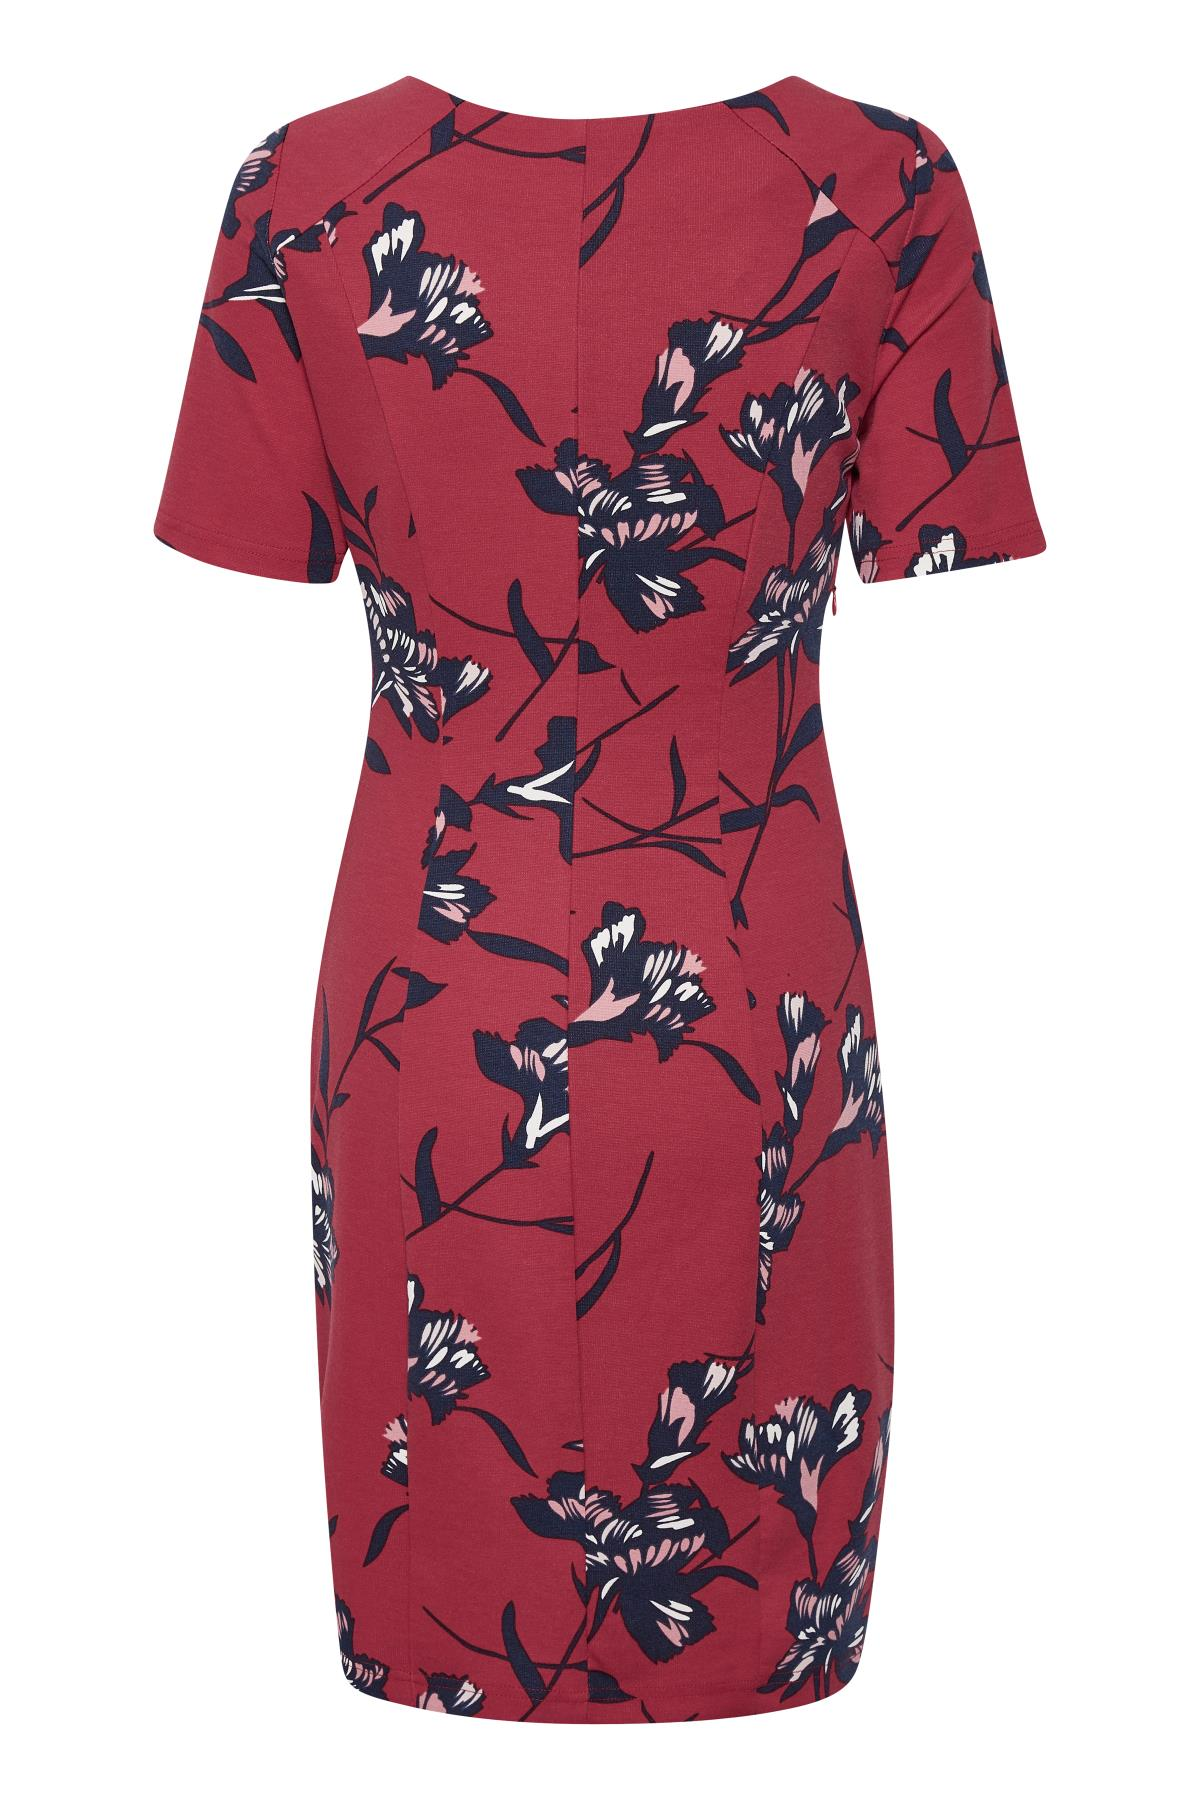 Rood/marineblauw Gebreide jurk van Kaffe – Door Rood/marineblauw Gebreide jurk van maat. XS-XXL hier